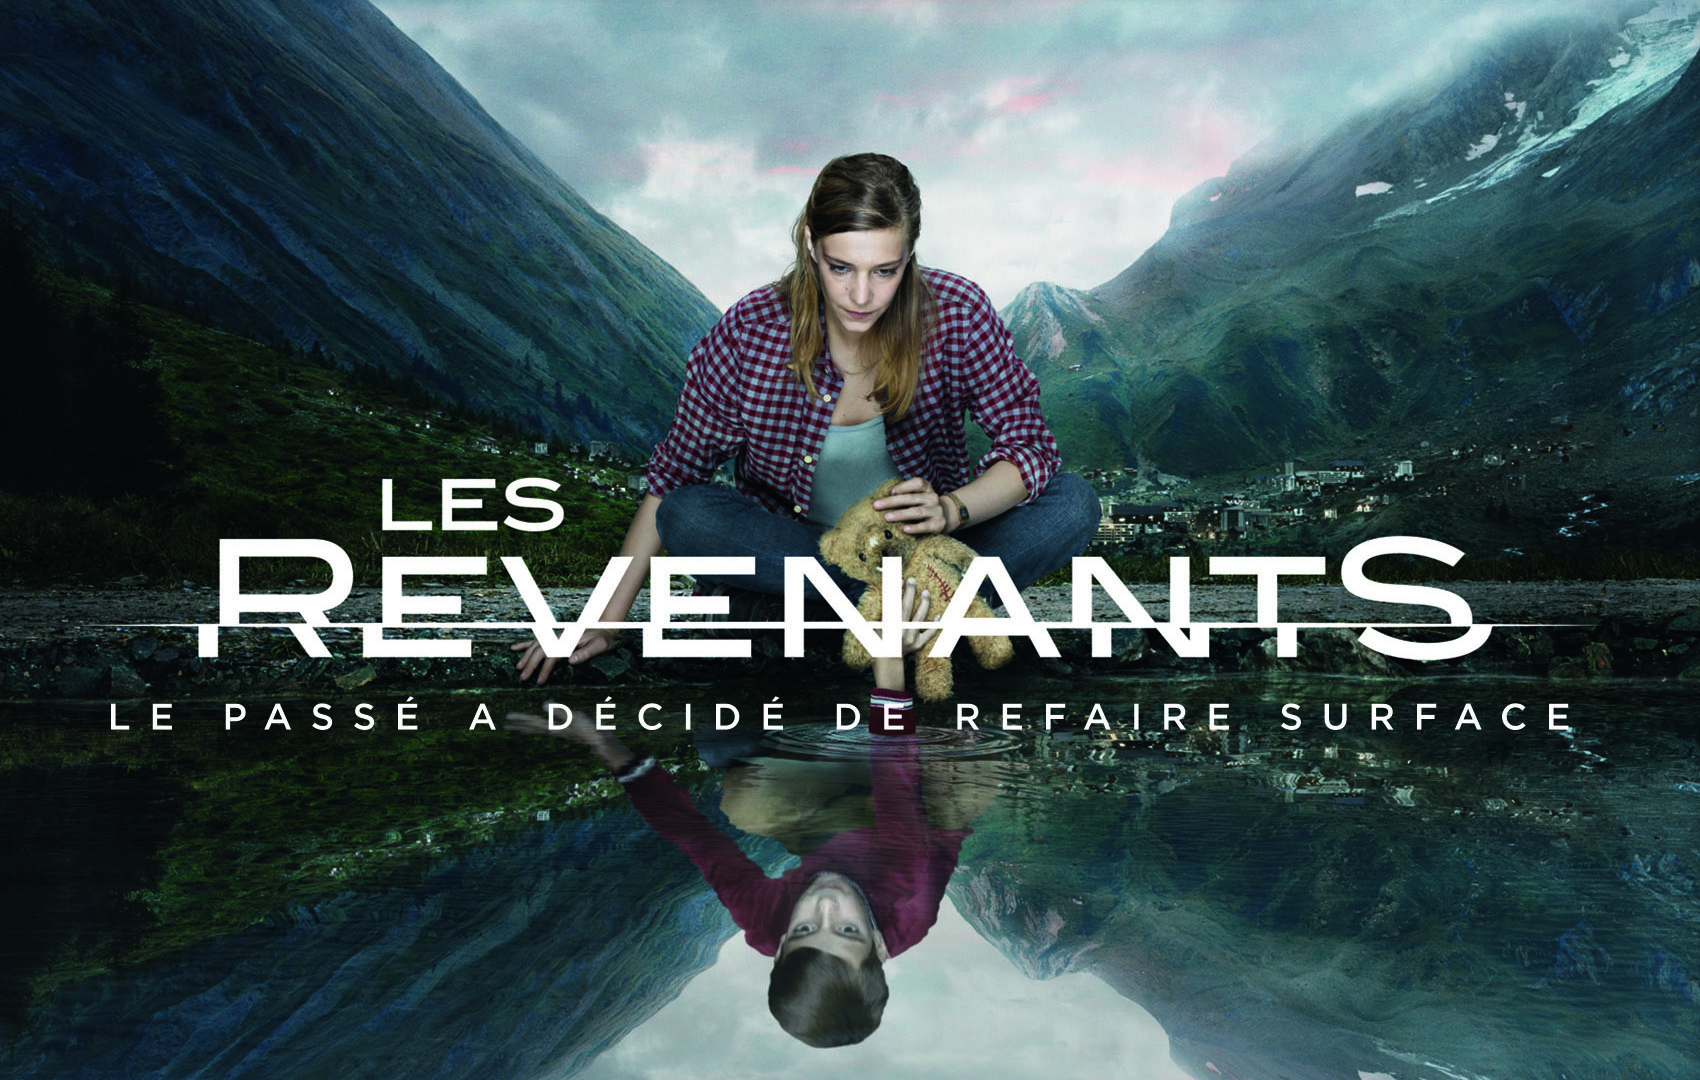 Les Revenants, finezza d'oltralpe